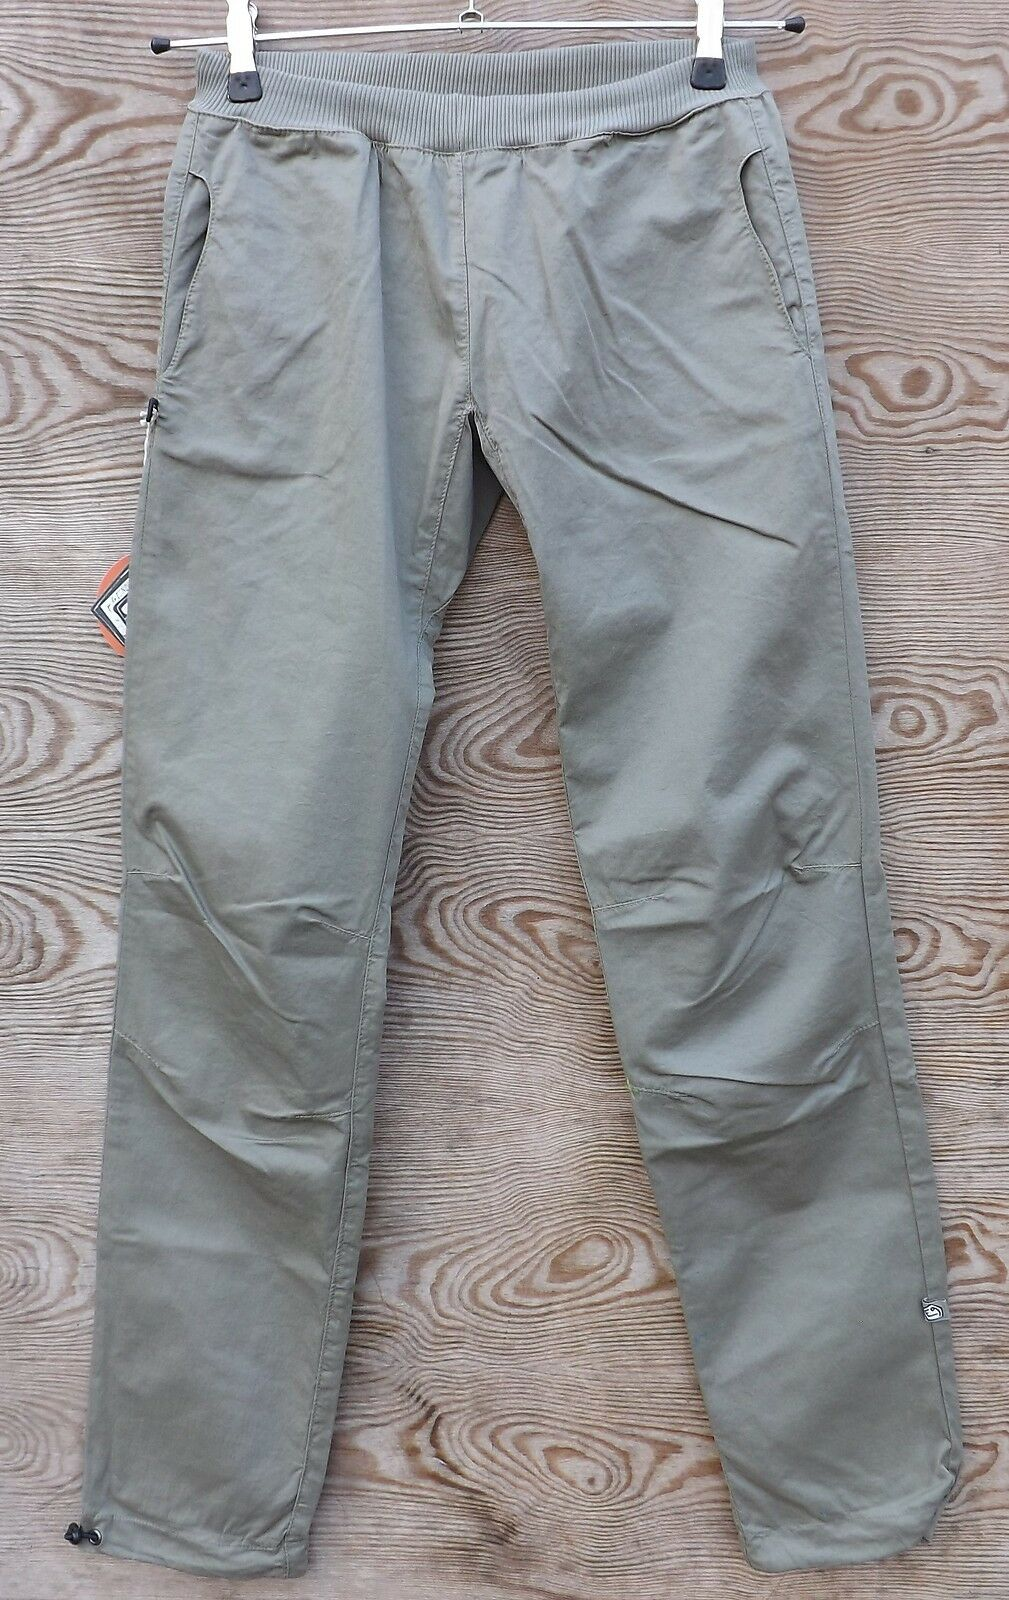 E9 Rapa - Ligero Pantalones Mujer, gris Cálido, Pantalones para Escalar